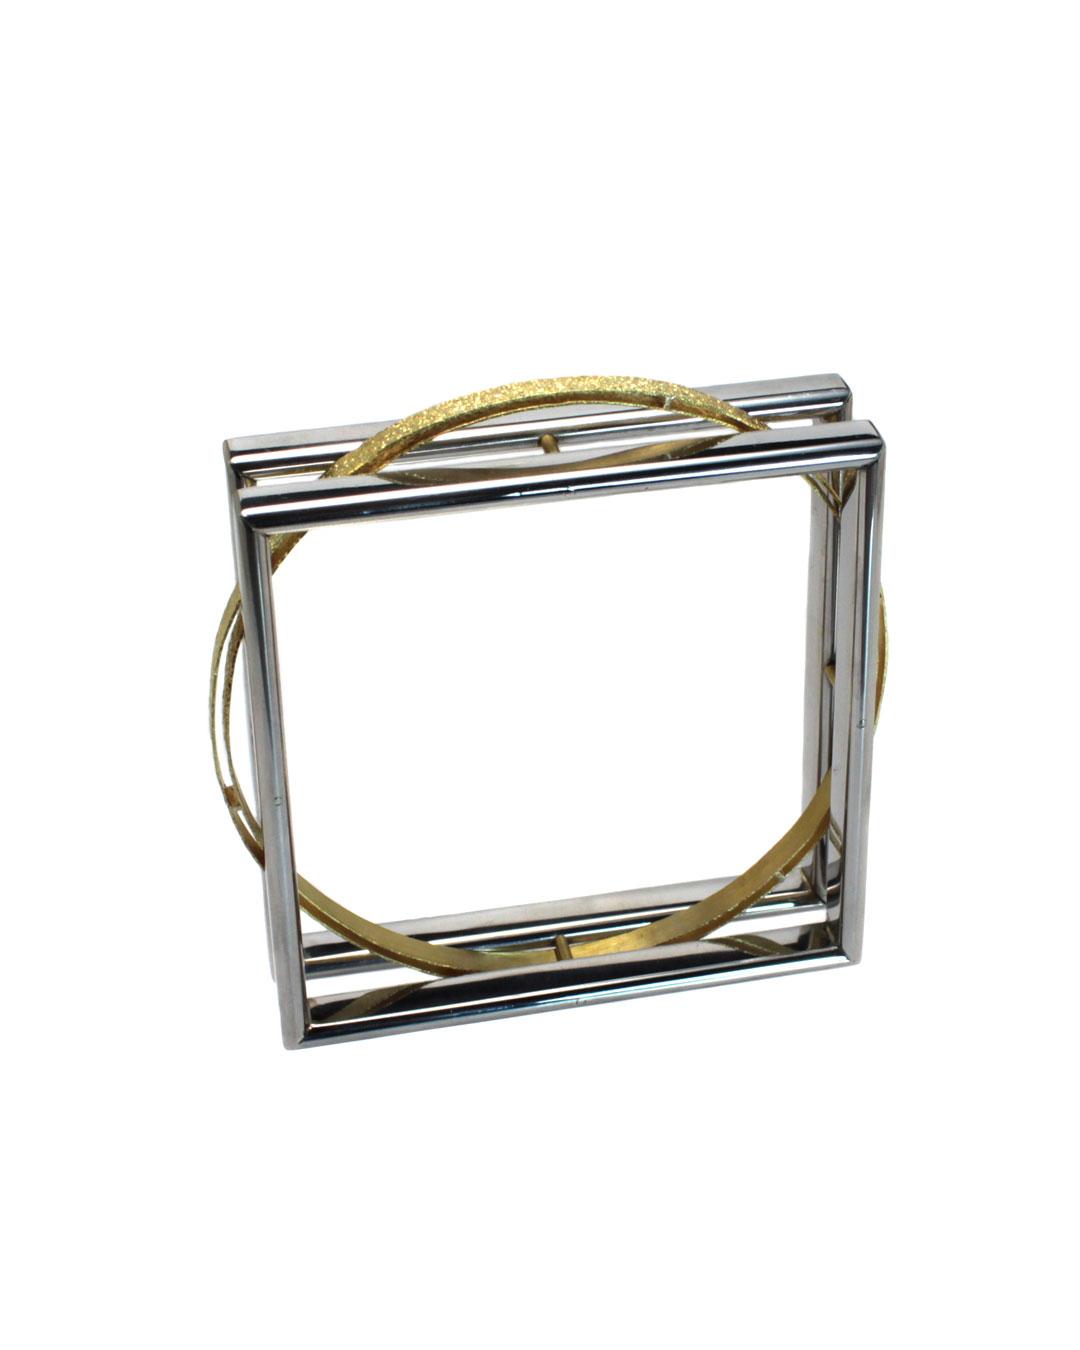 Okinari Kurokawa, untitled, 2014, bracelet, 20ct gold, stainless steel, 76 x 76 x 20 mm, €2950